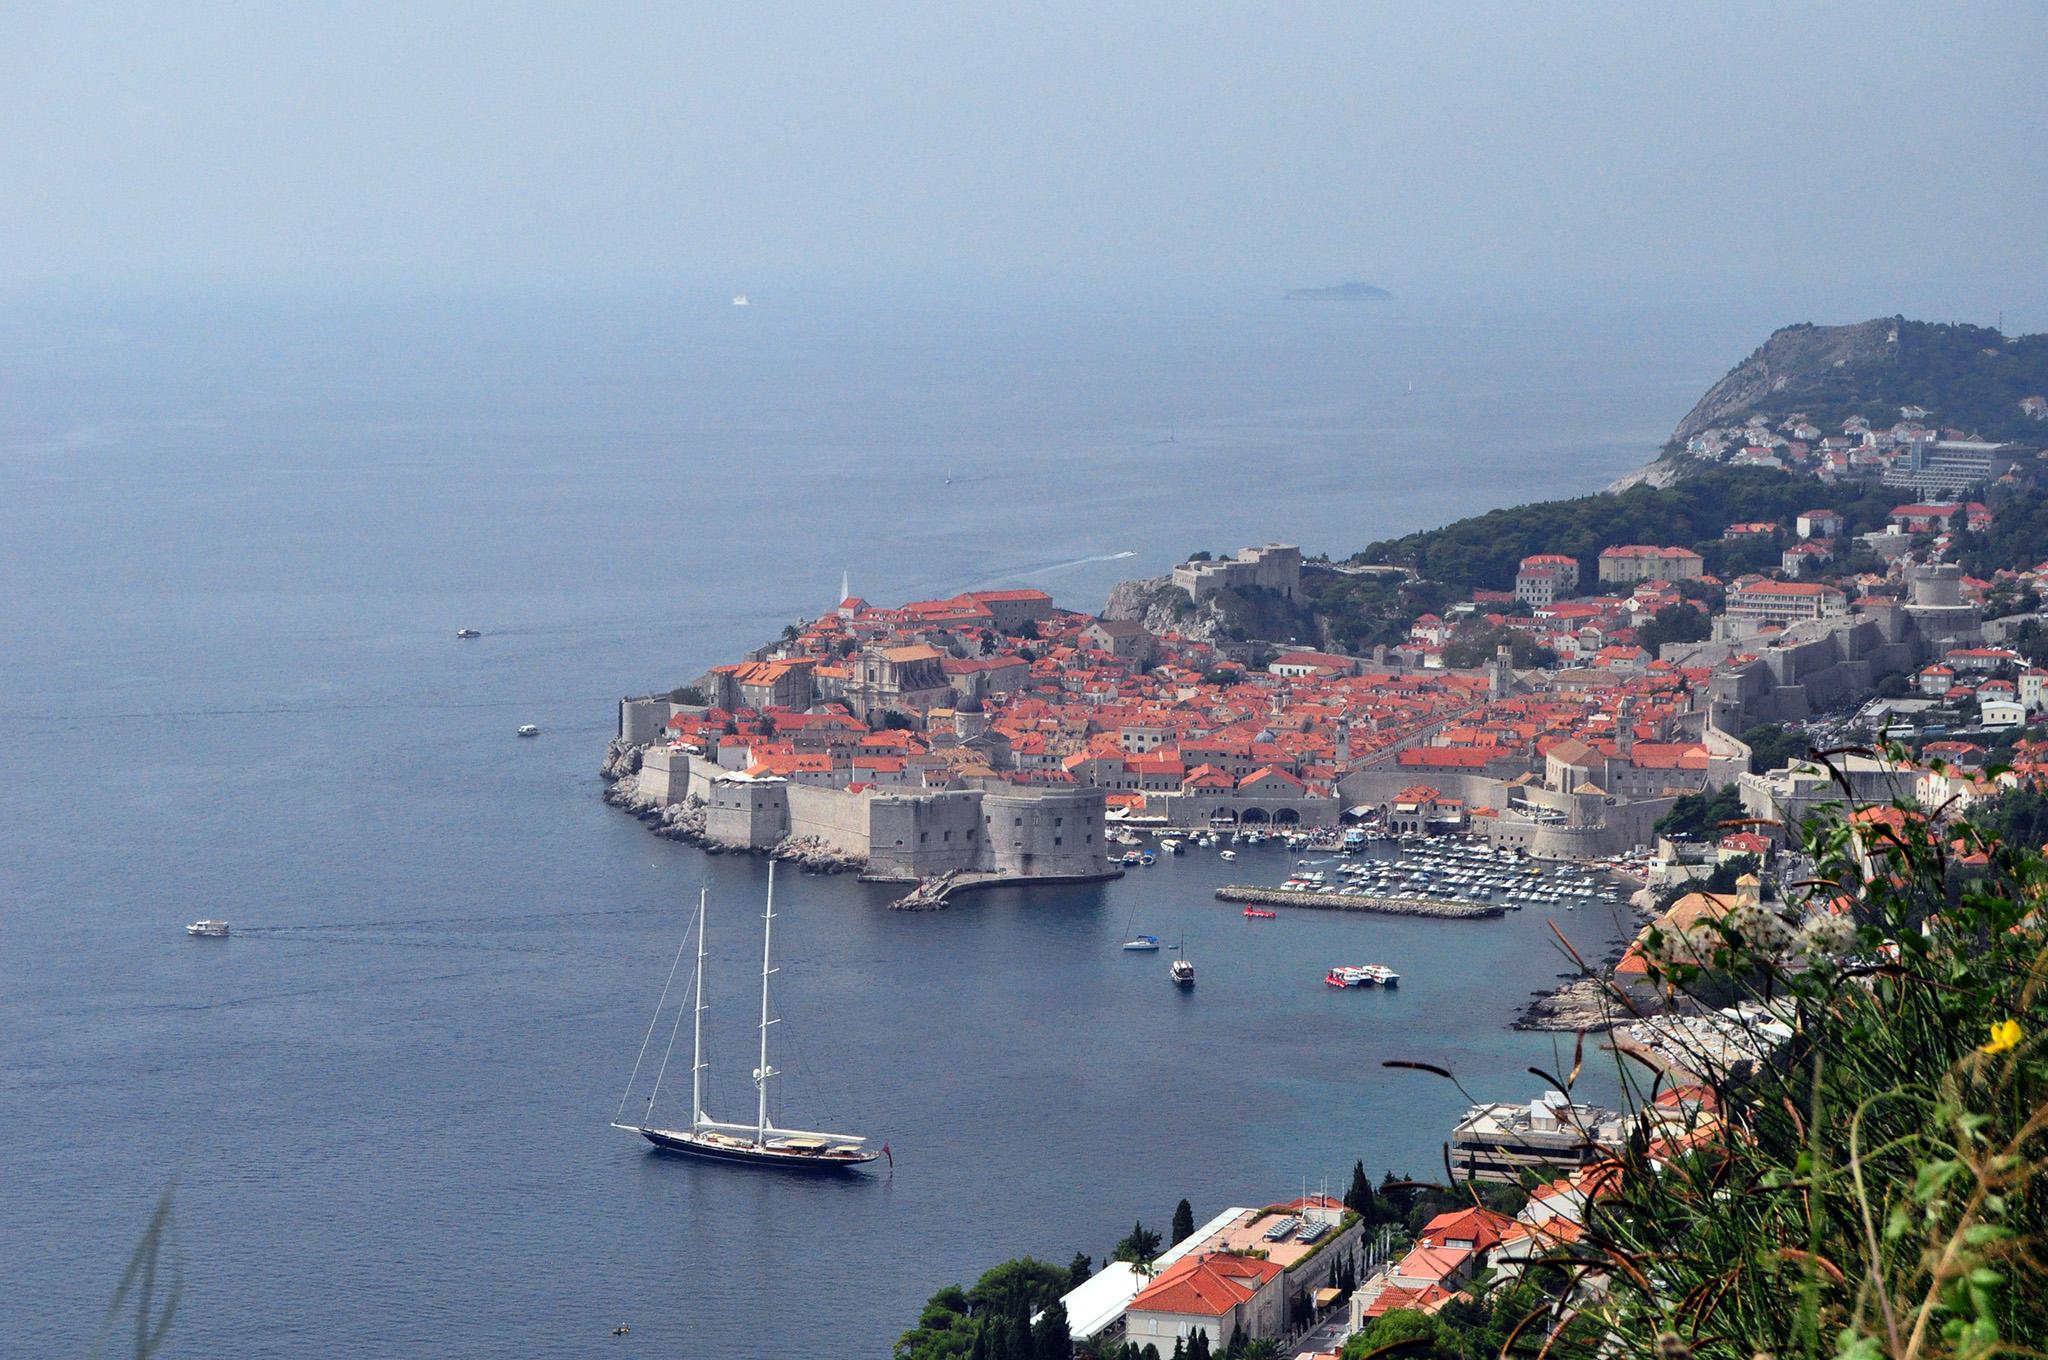 [Game of the Thrones Set] Dubrovnik, Croatia